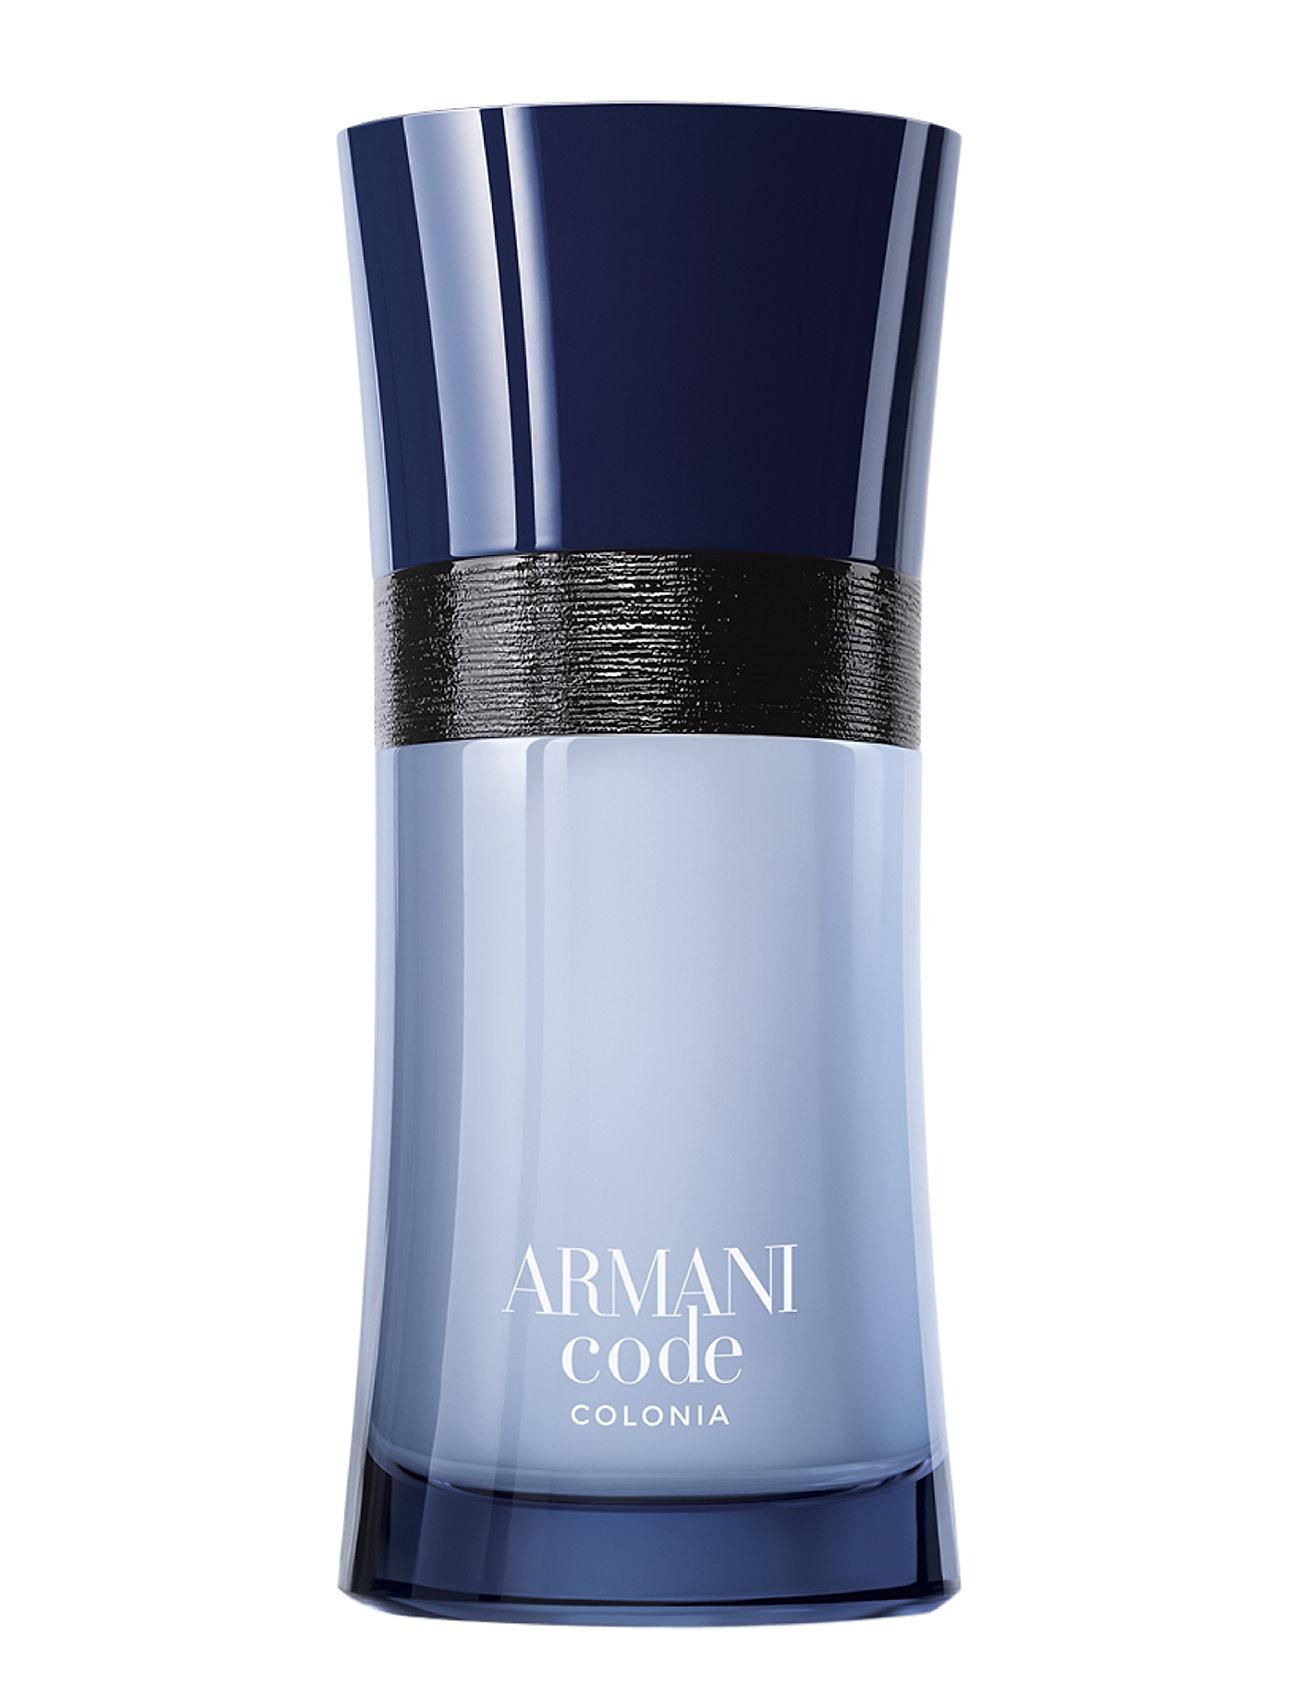 Armani code colonia eau de toilette 50 ml fra giorgio armani fra boozt.com dk